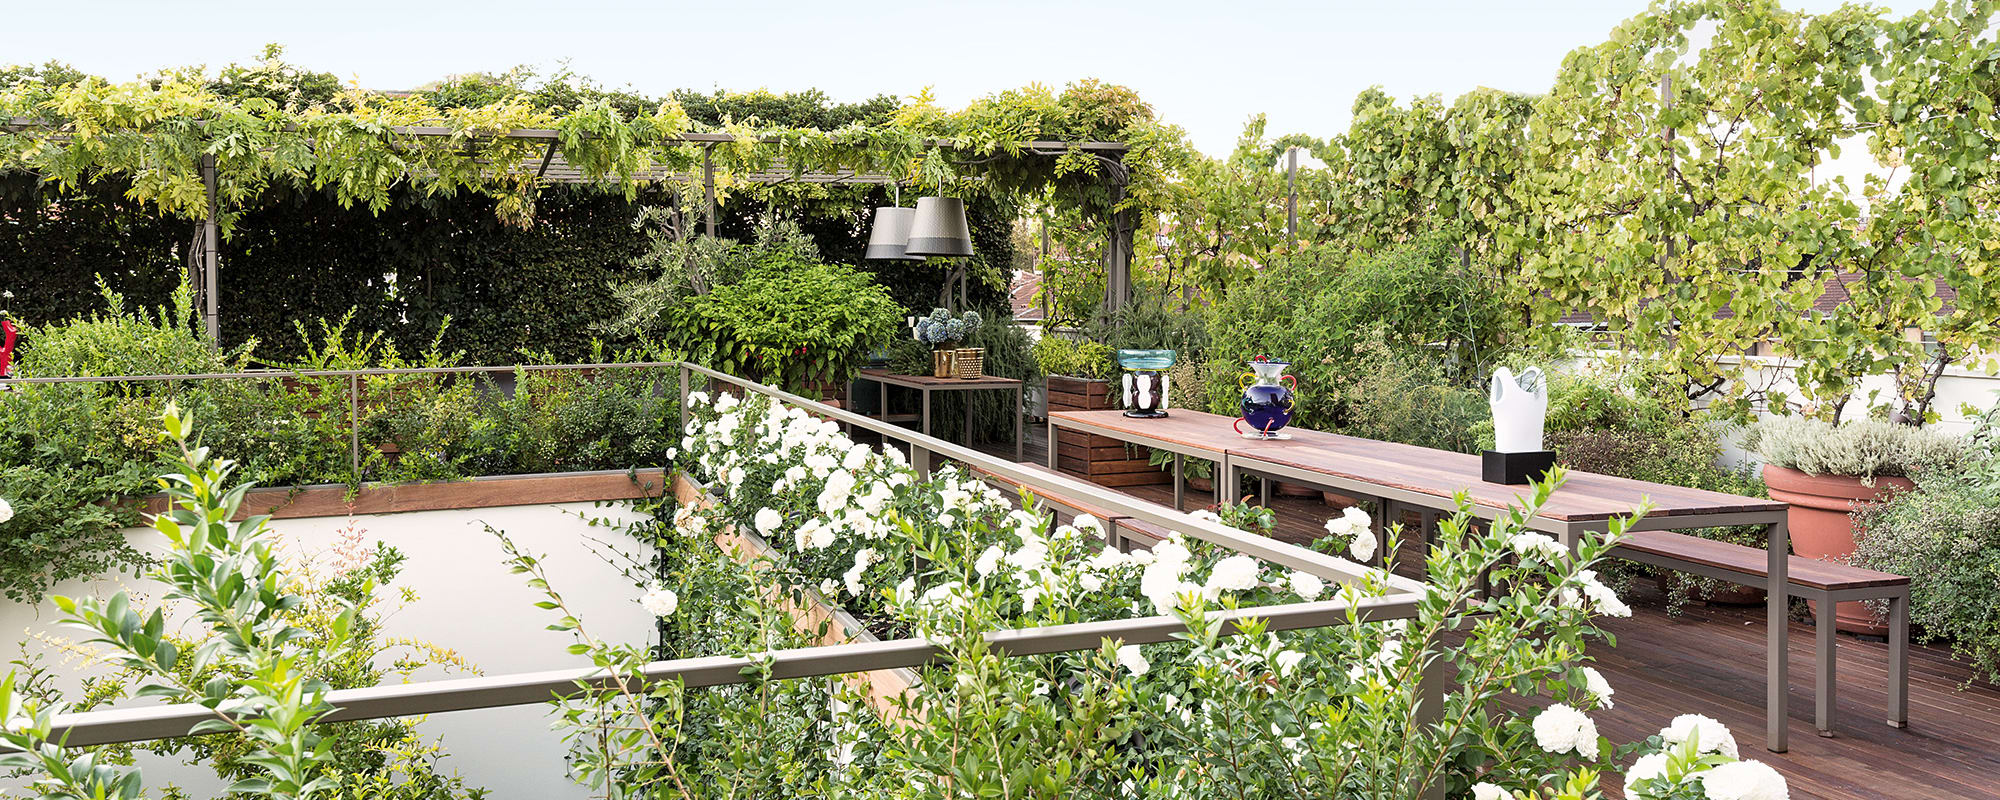 Giovannoni, Outdoor, Dachterrasse